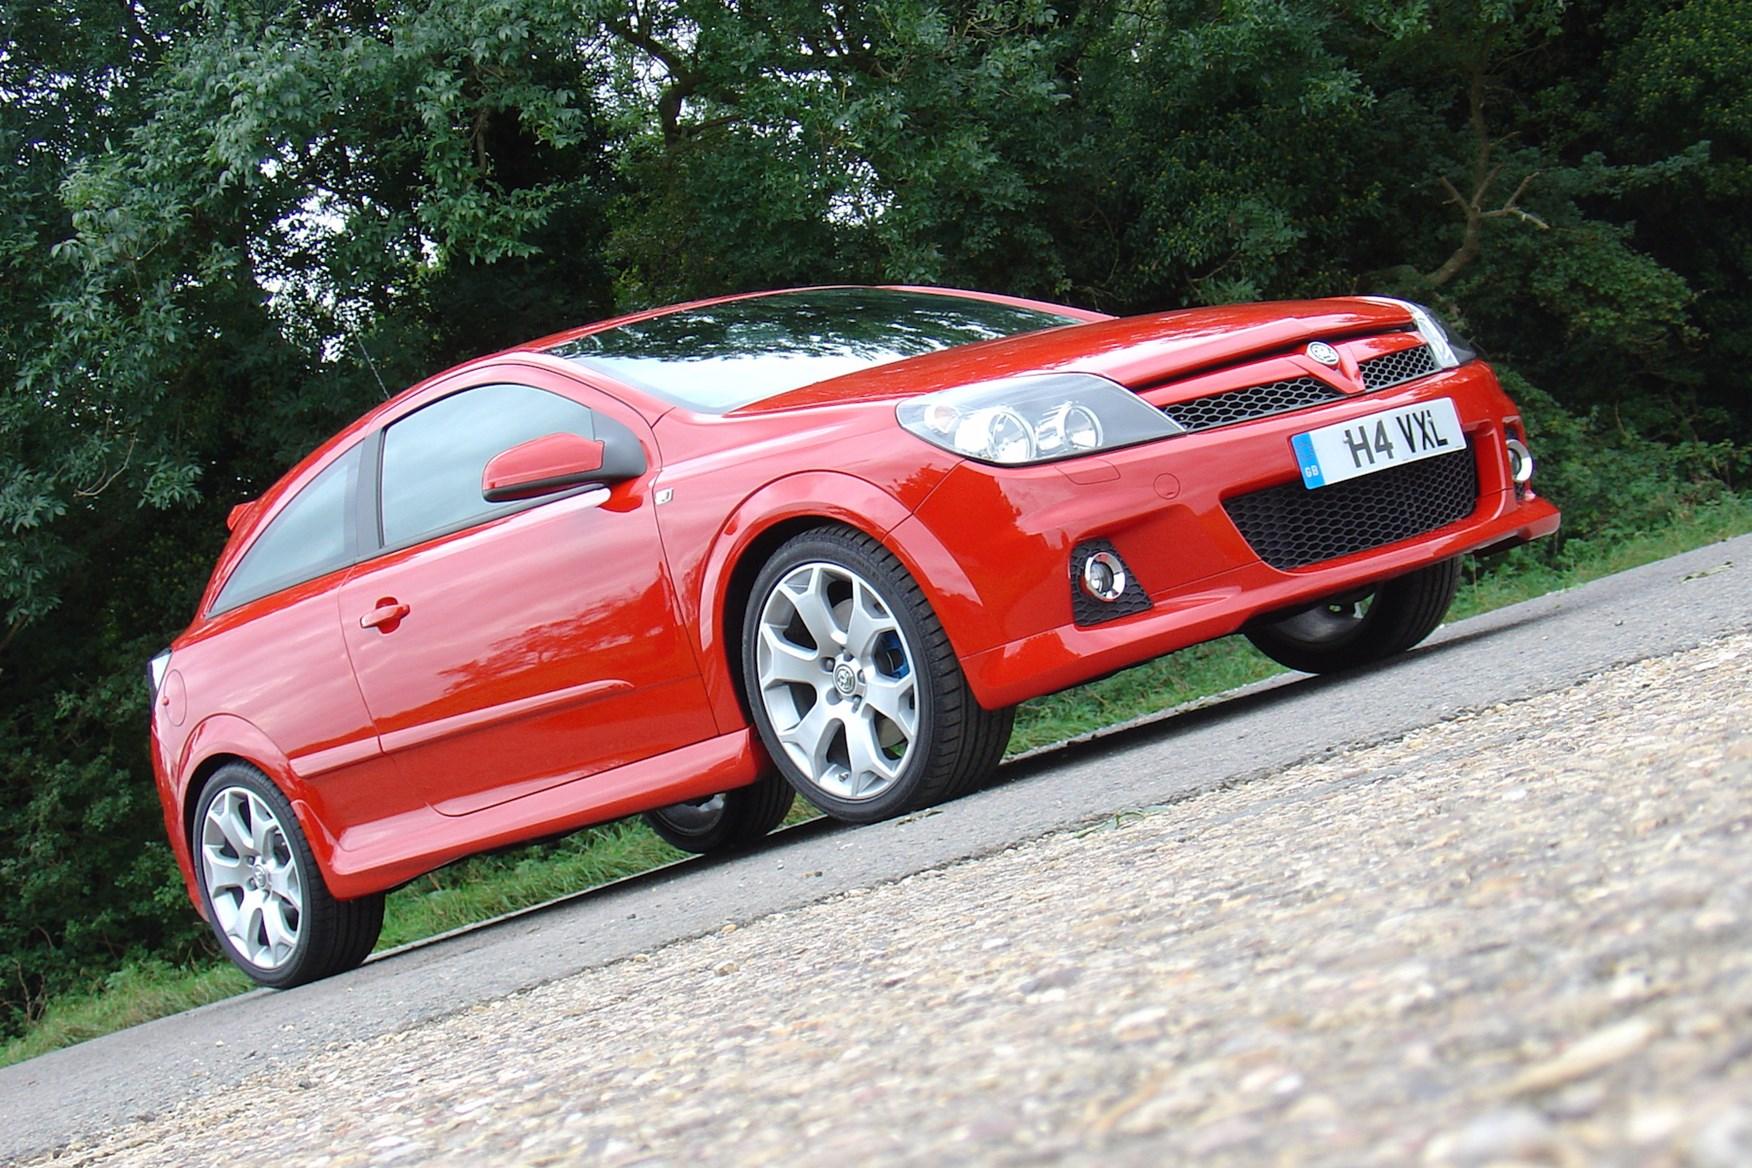 The Vauxhall Astra VXR